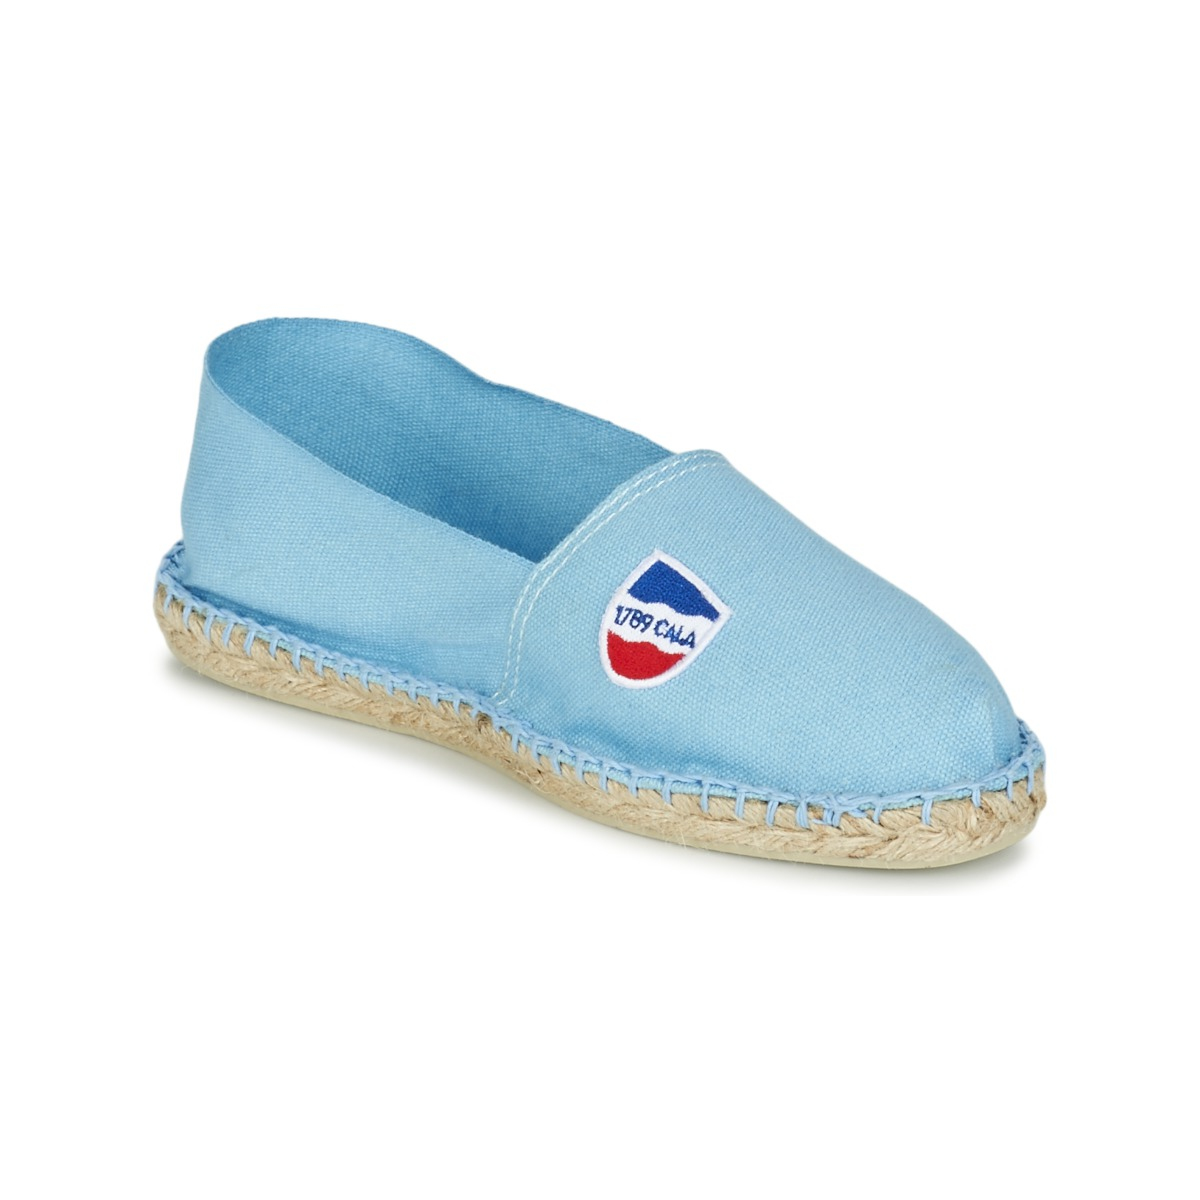 1789 Cala CLASSIQUE Blue